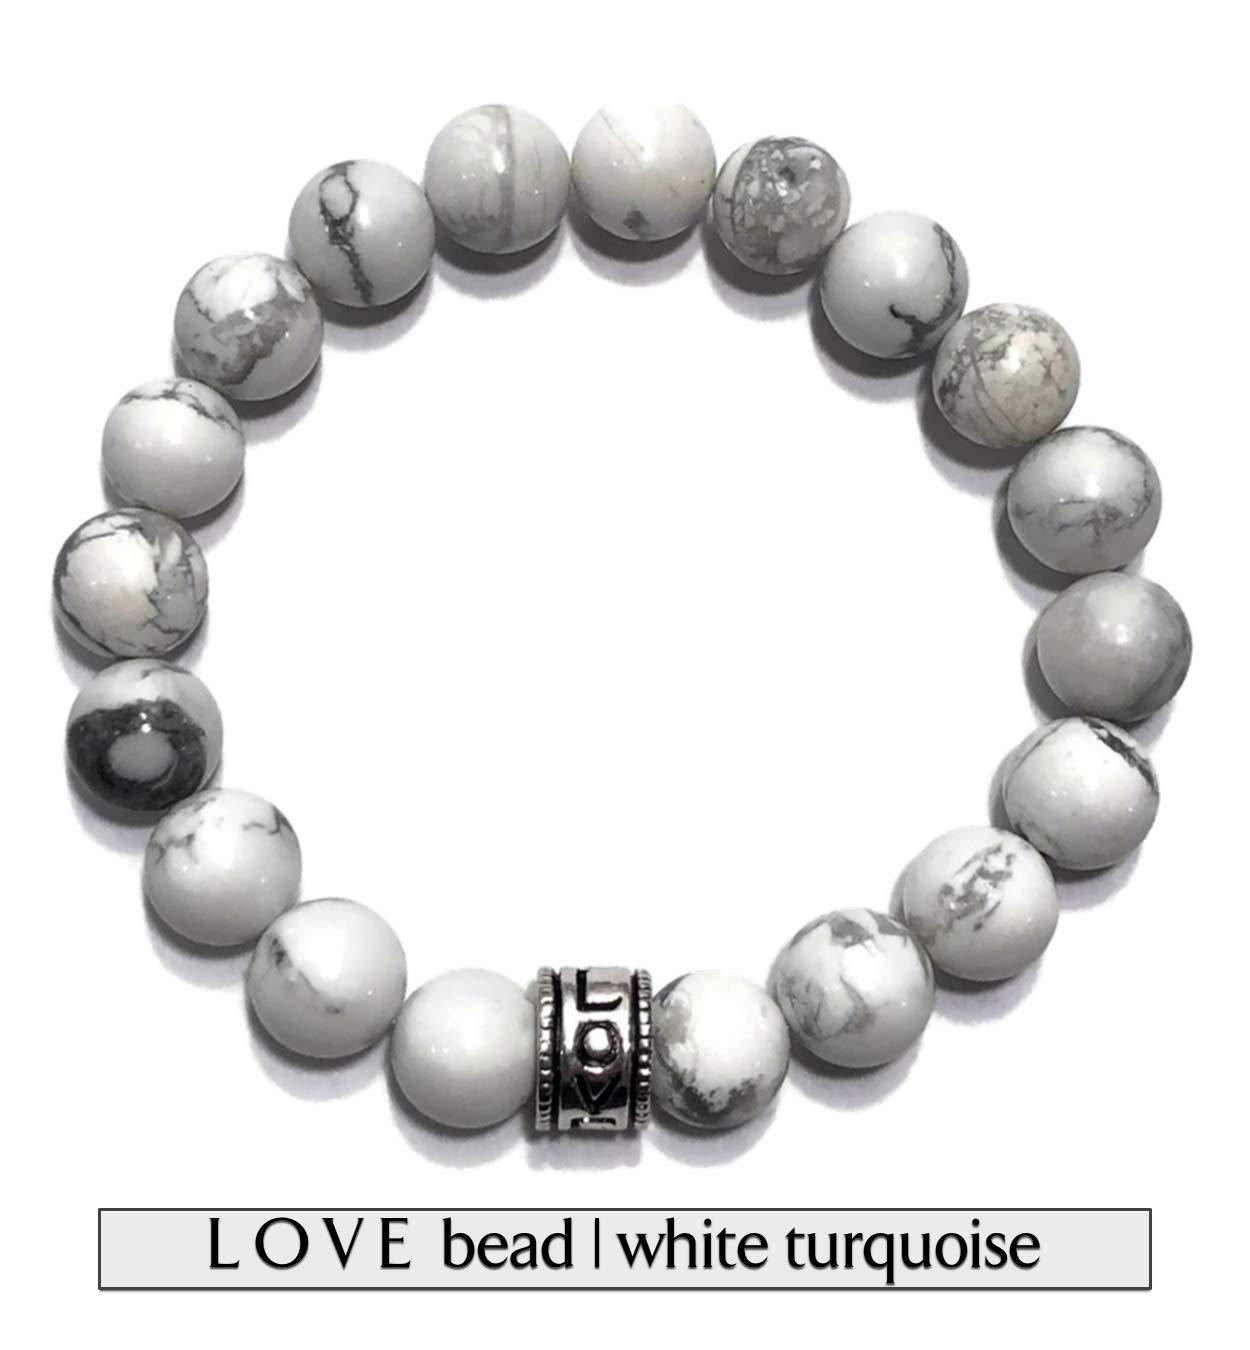 KarmaArm Calming Love Bracelet | Communicate | Yoga Meditation Mantra Mala | Self-Care Wellness Chakra Reiki Healing Energy Beaded Zen Wristband | White Turquoise Jewelry (7)